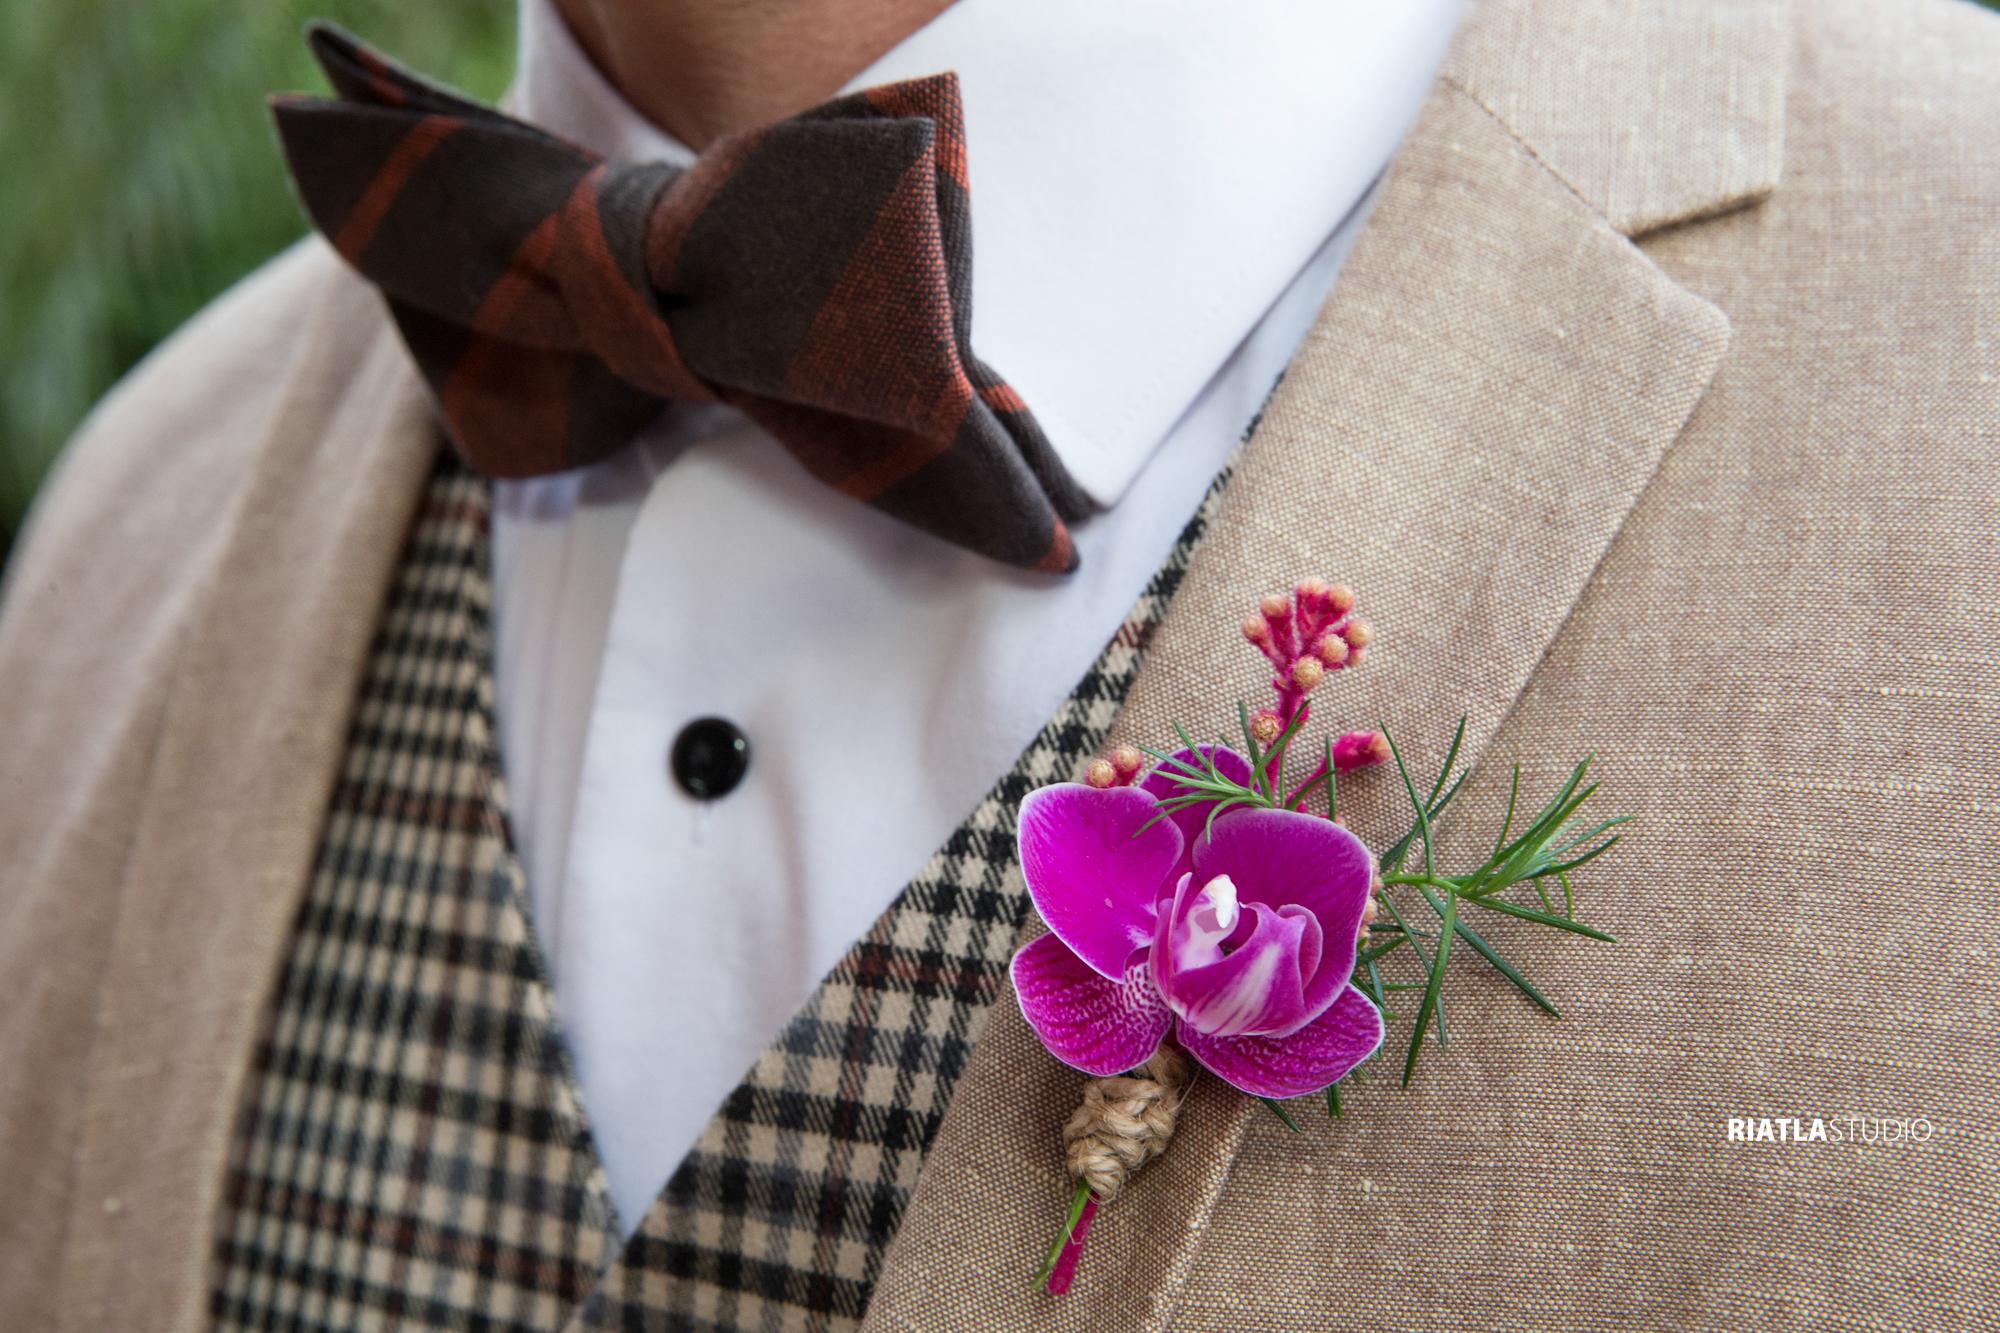 terno bege com gravata marrom